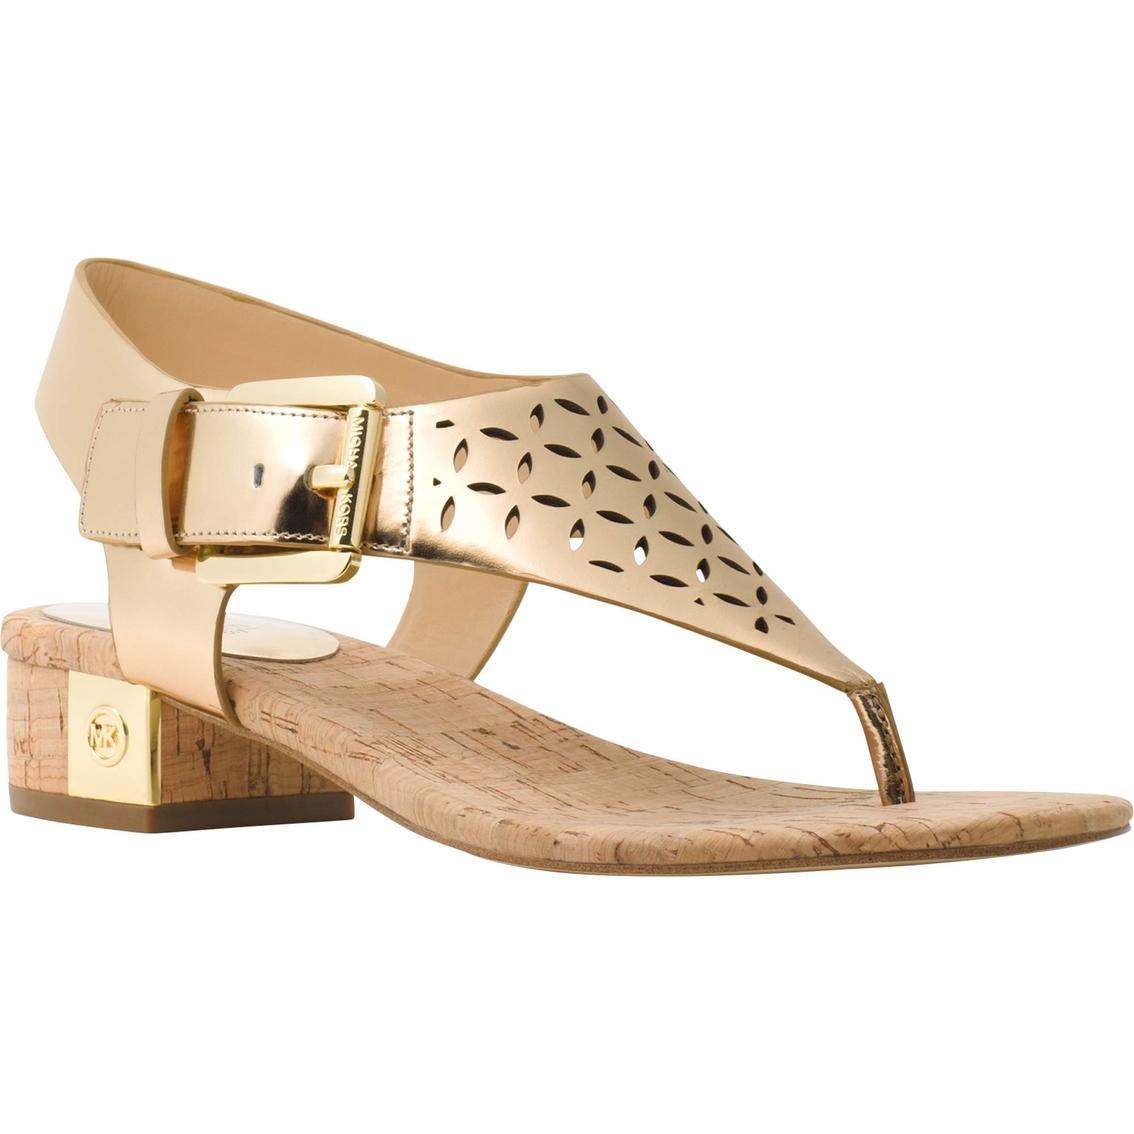 64907b0620f Michael Kors London Thong Sandals